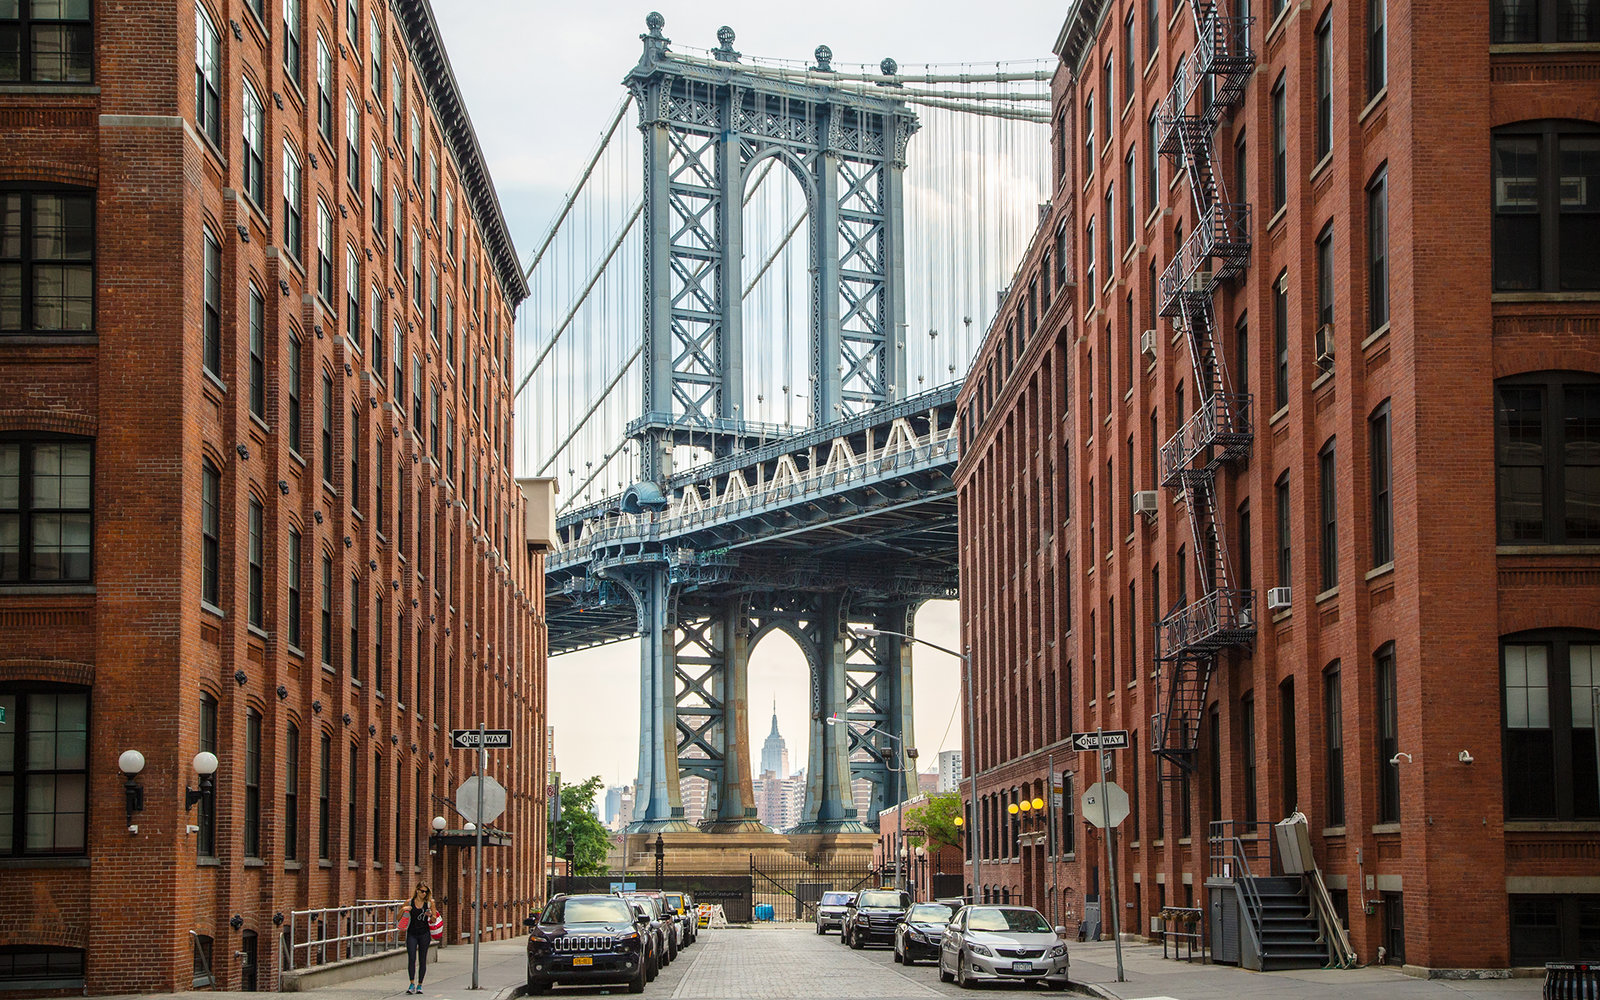 Empire State Building, Manhattan Bridge and Dumbo